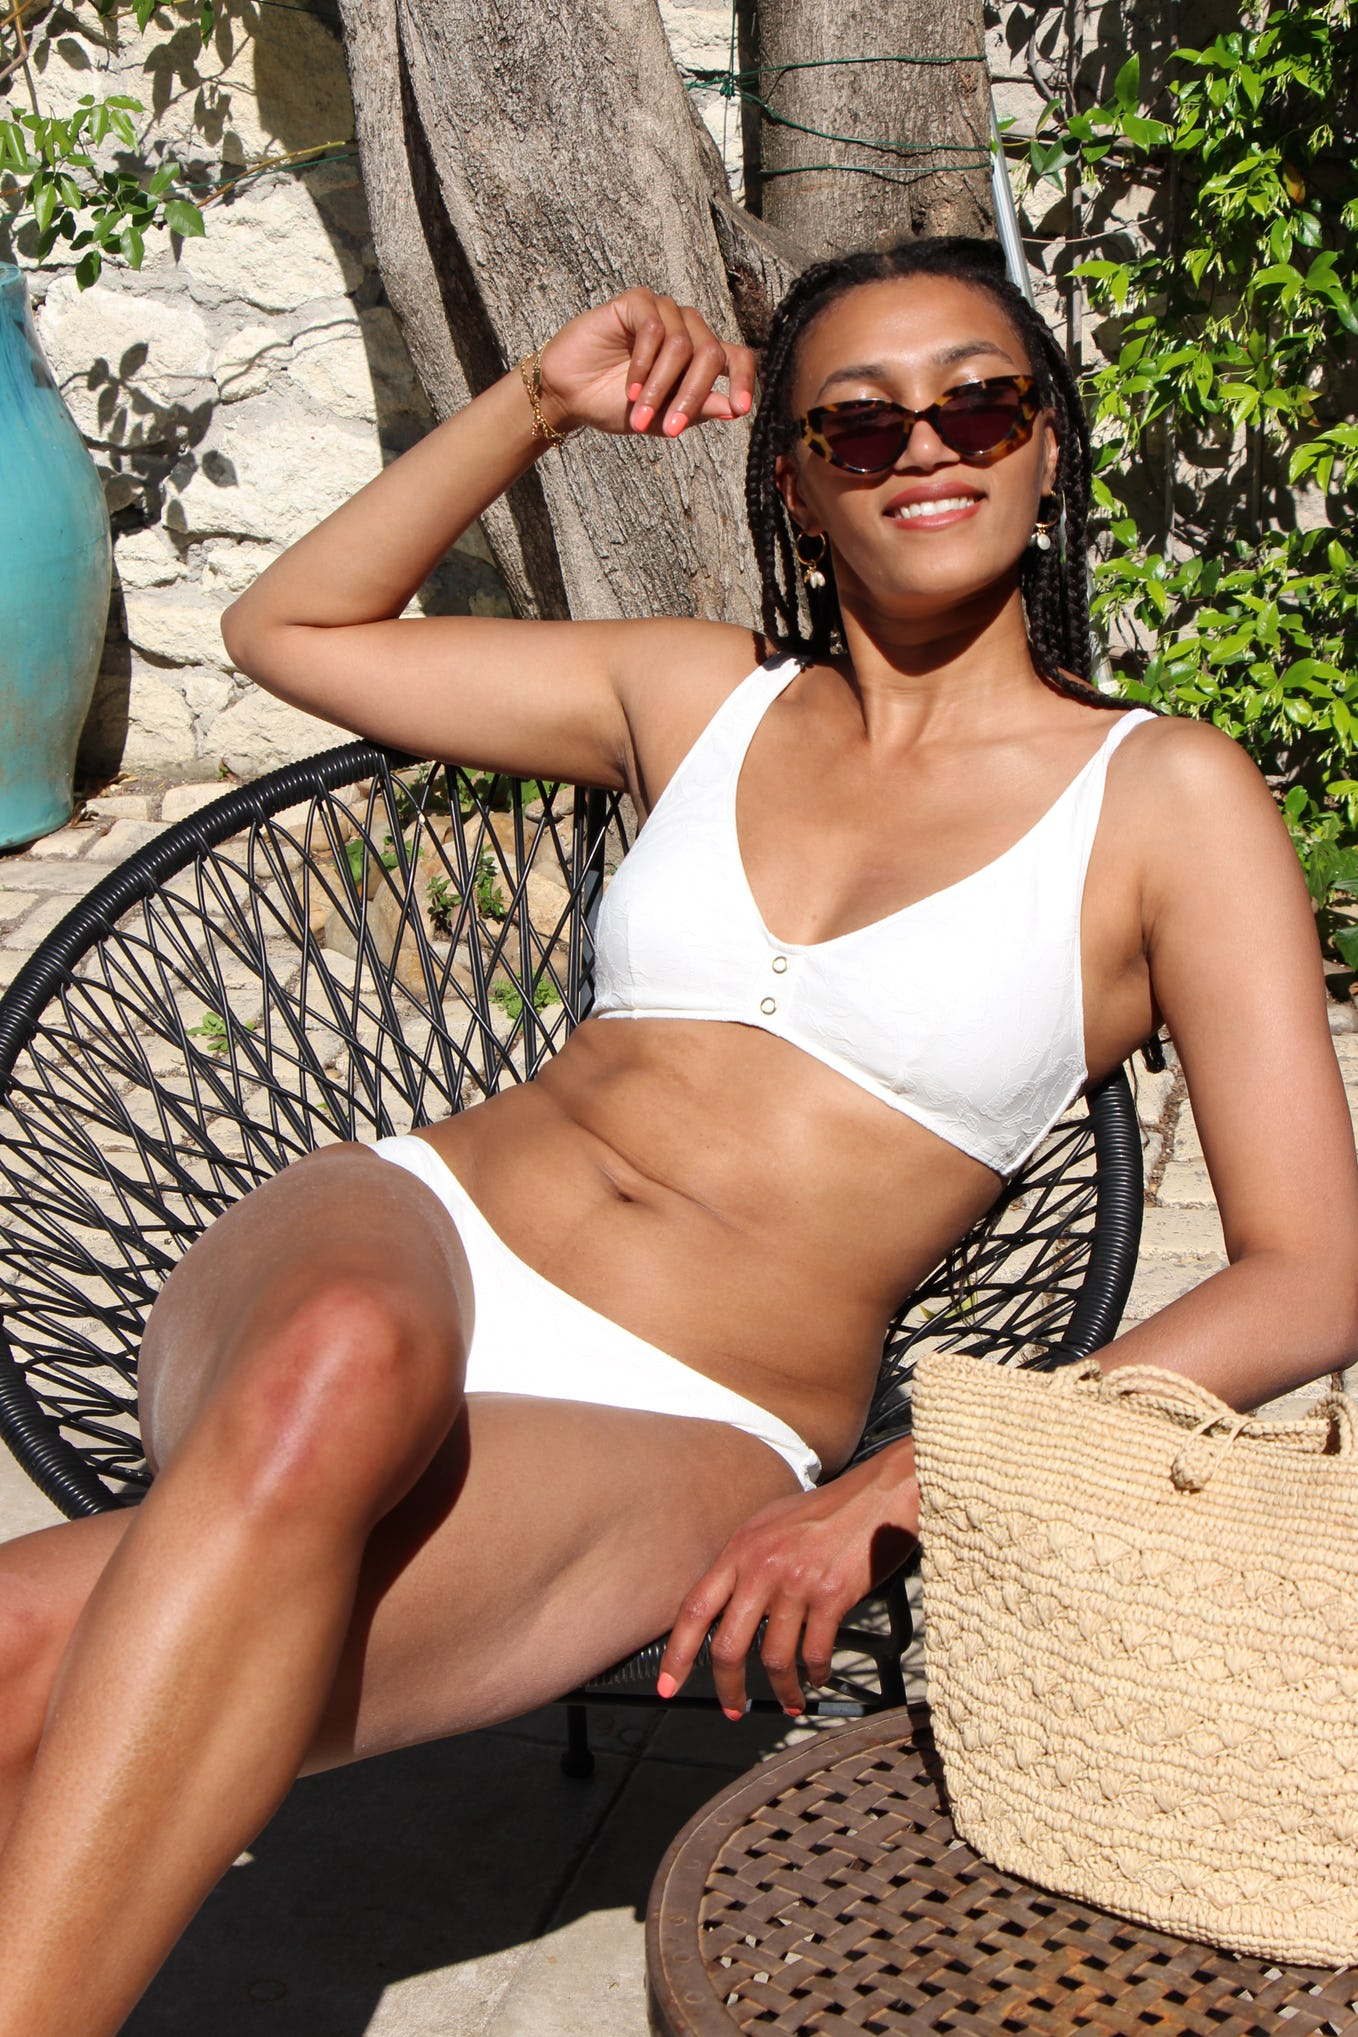 Léna is wearing the Bikini Partir avec toi in white